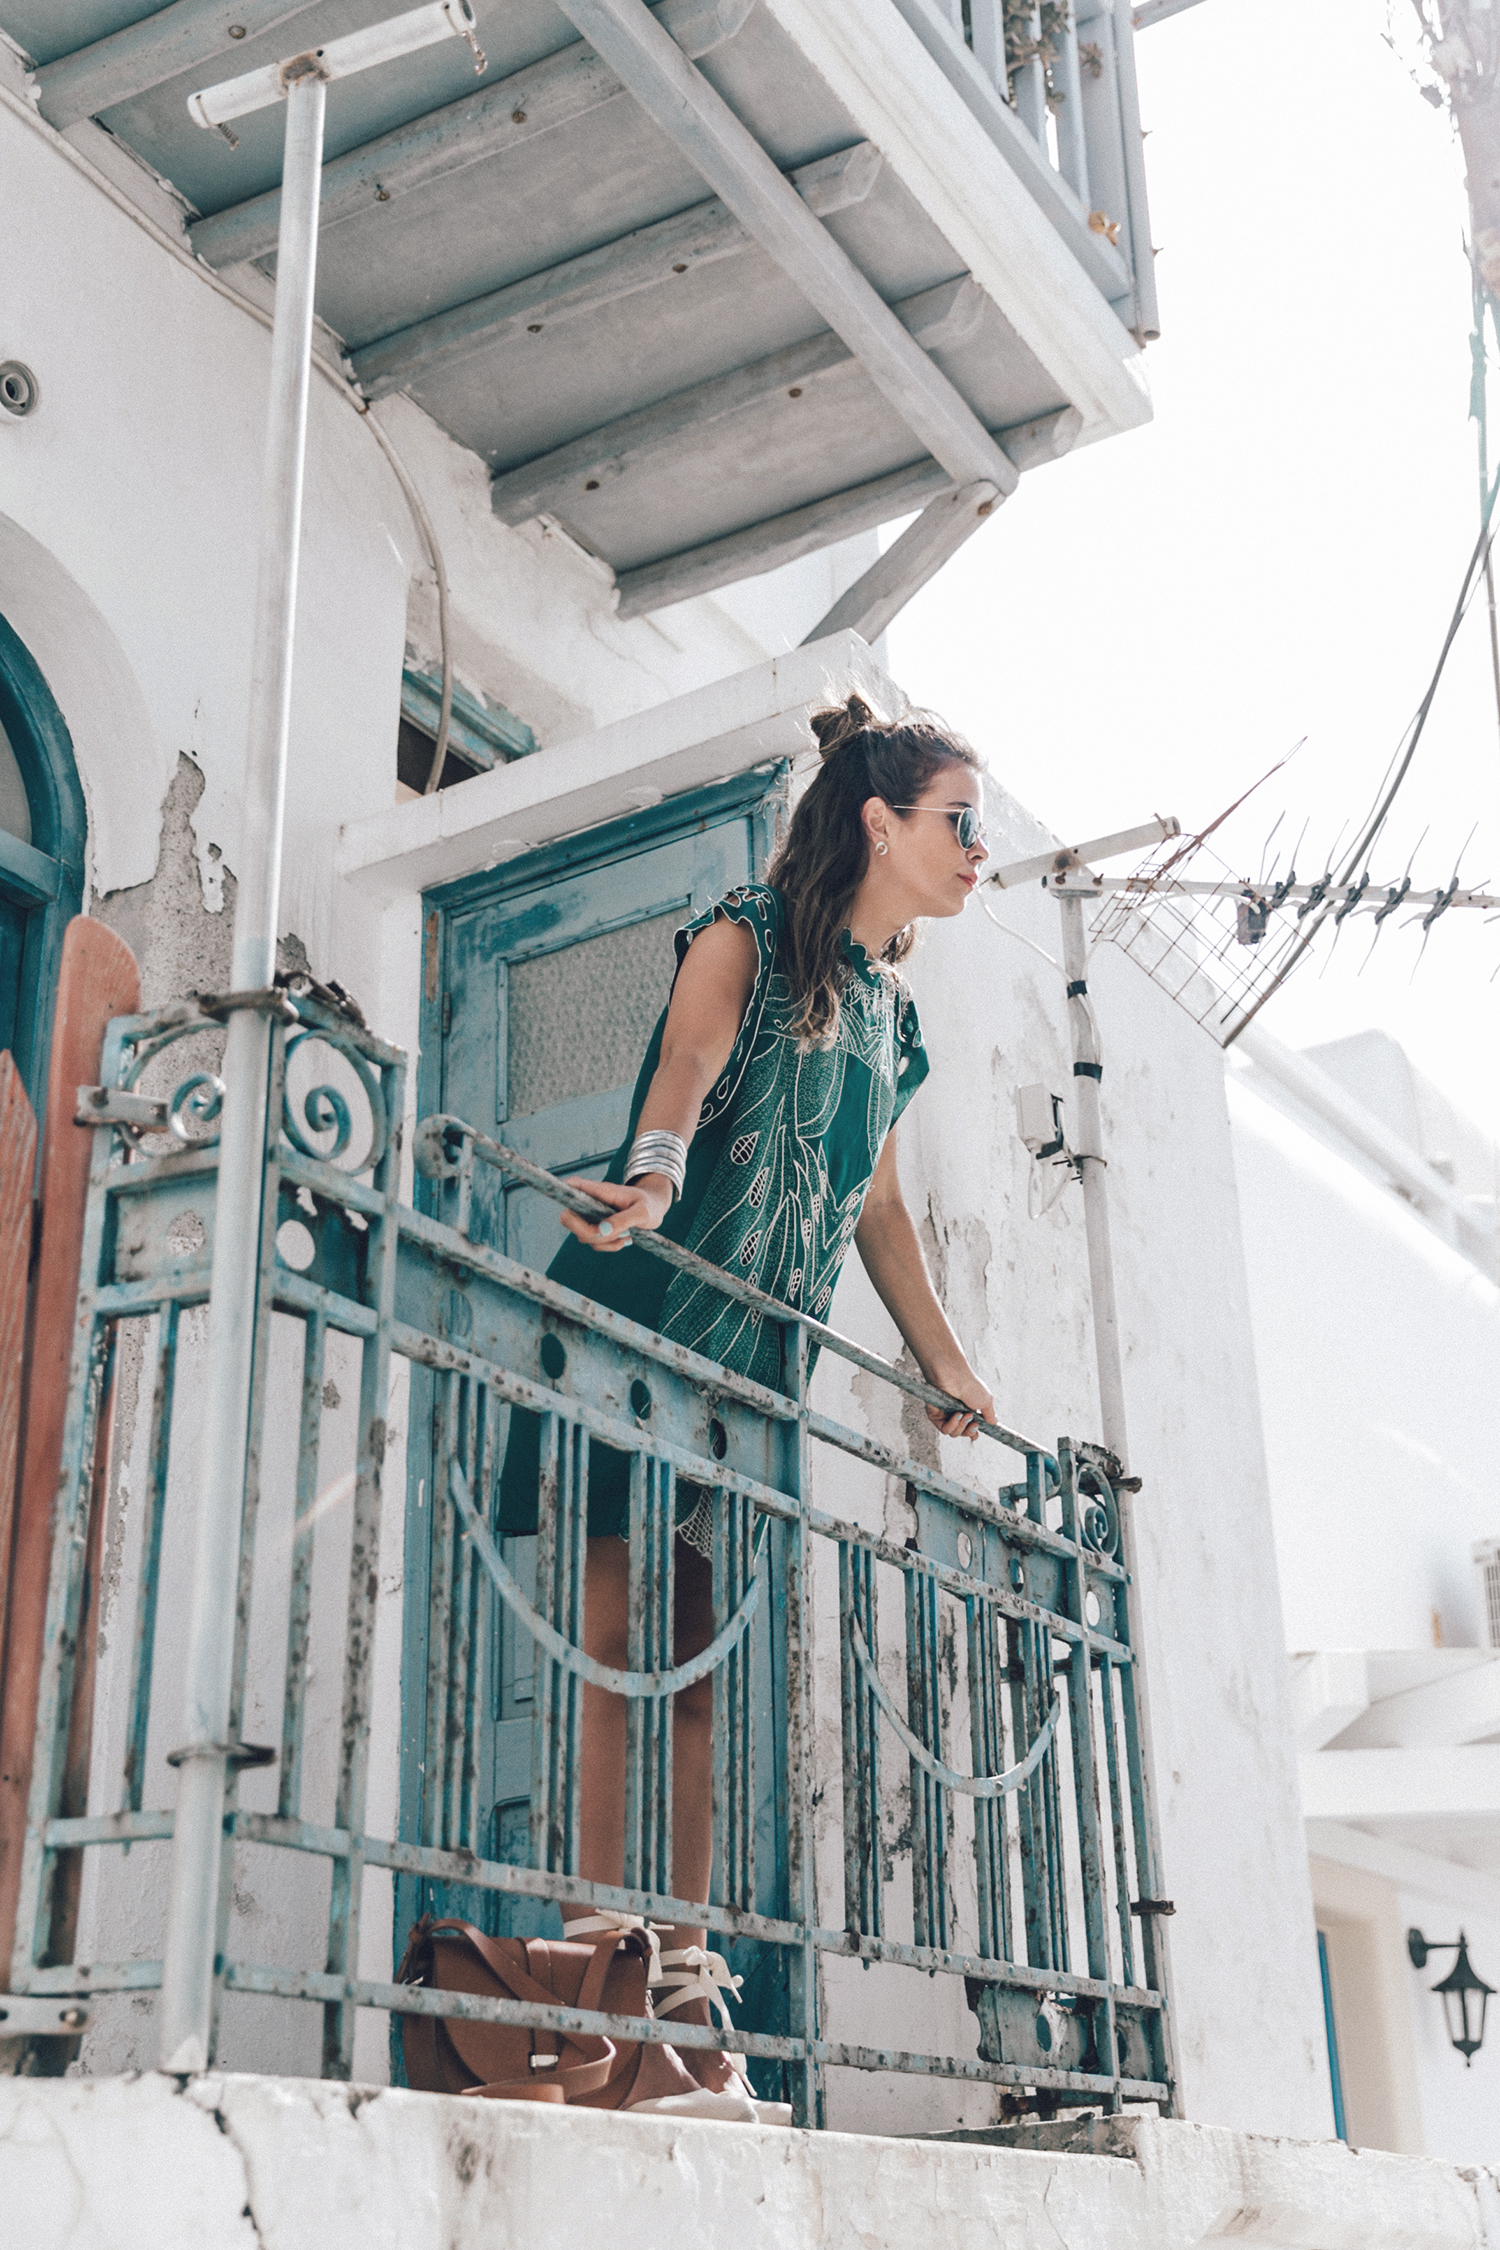 Tularosa_Dress-Soludos_Escapes-Soludos_Espadrilles-Sezane_Bag-Leather_Crossbody_Bag-Boho_Outfit-Look-Ray_Ban-Street_Style-Mykonos-Greece-Collage_Vintage-28